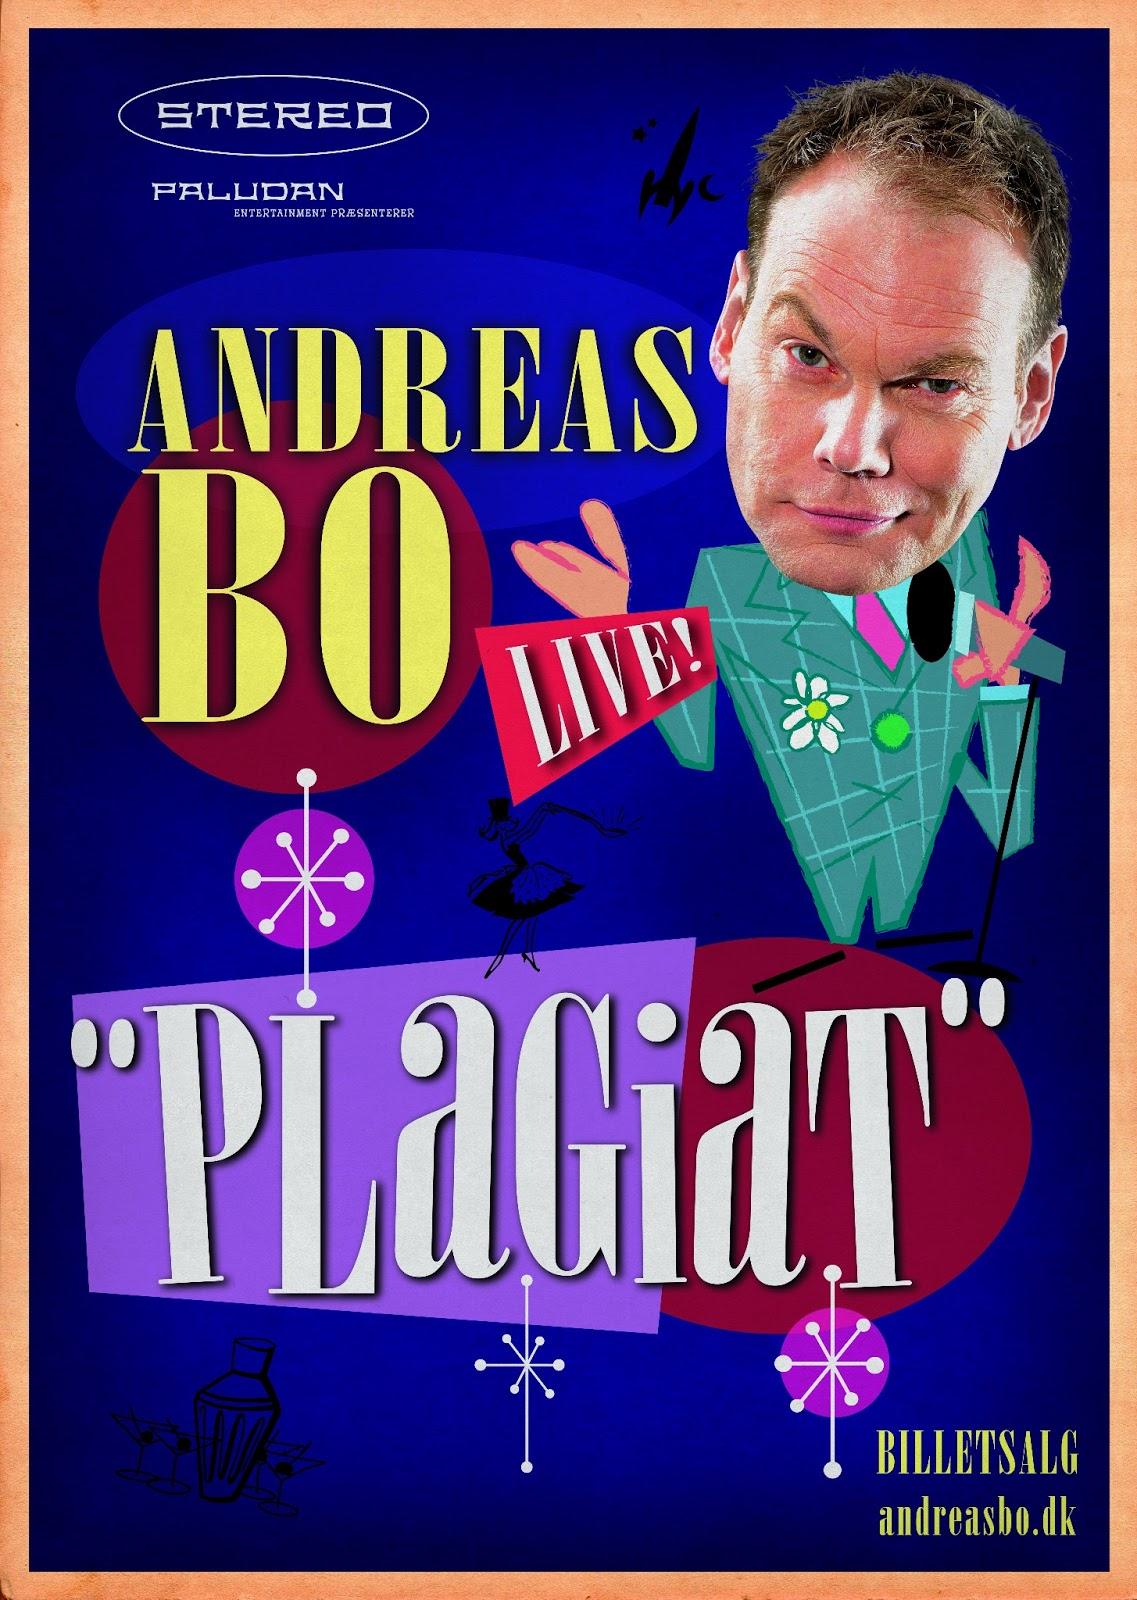 Andreas Bo, Plagiat, standup, live, anmeldelse, show, portalen greve, parodi, sjov, grin